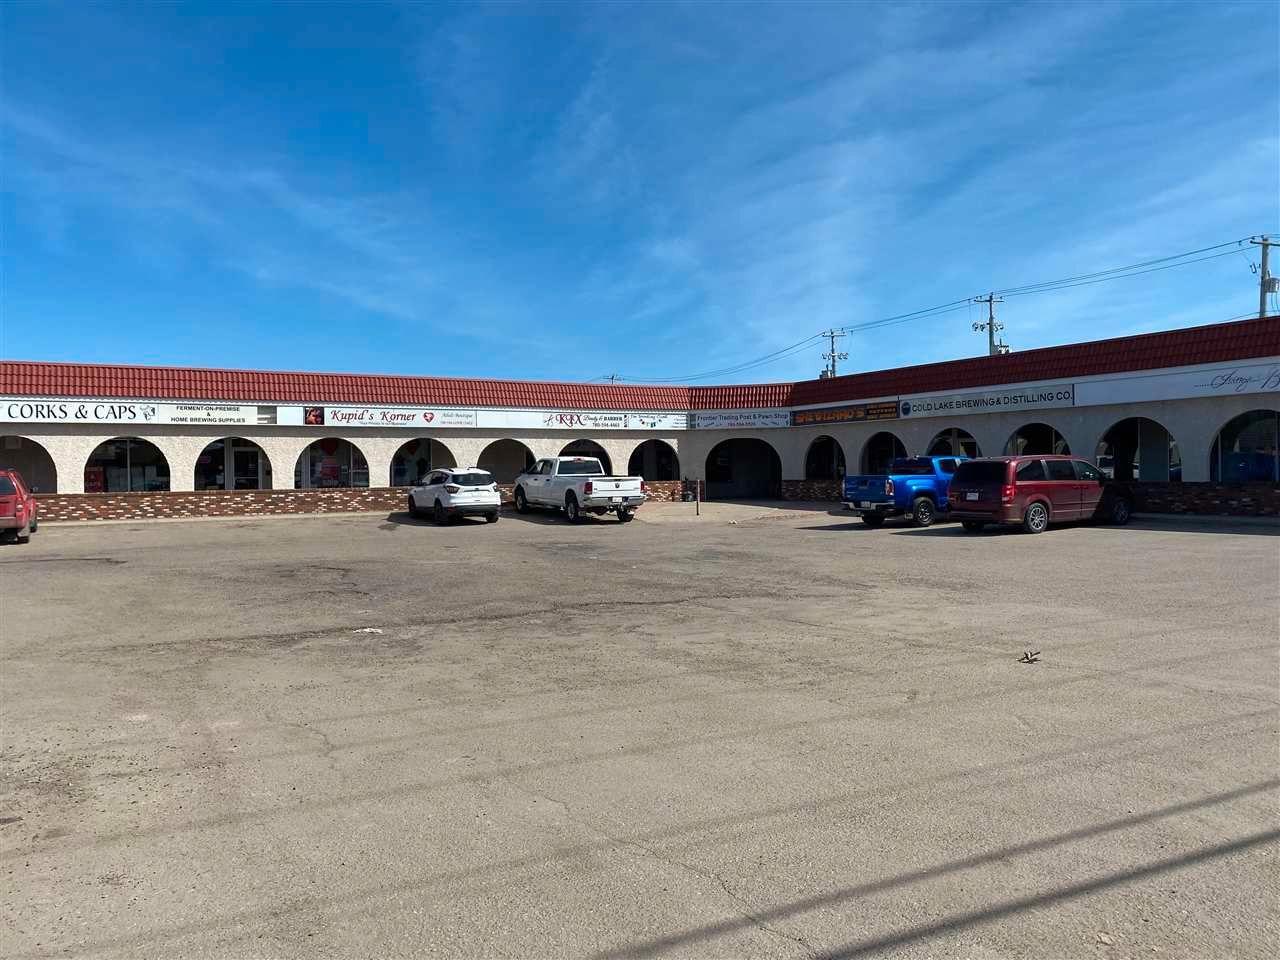 Main Photo: #5 5109 51 Avenue: Cold Lake Retail for sale : MLS®# E4242766